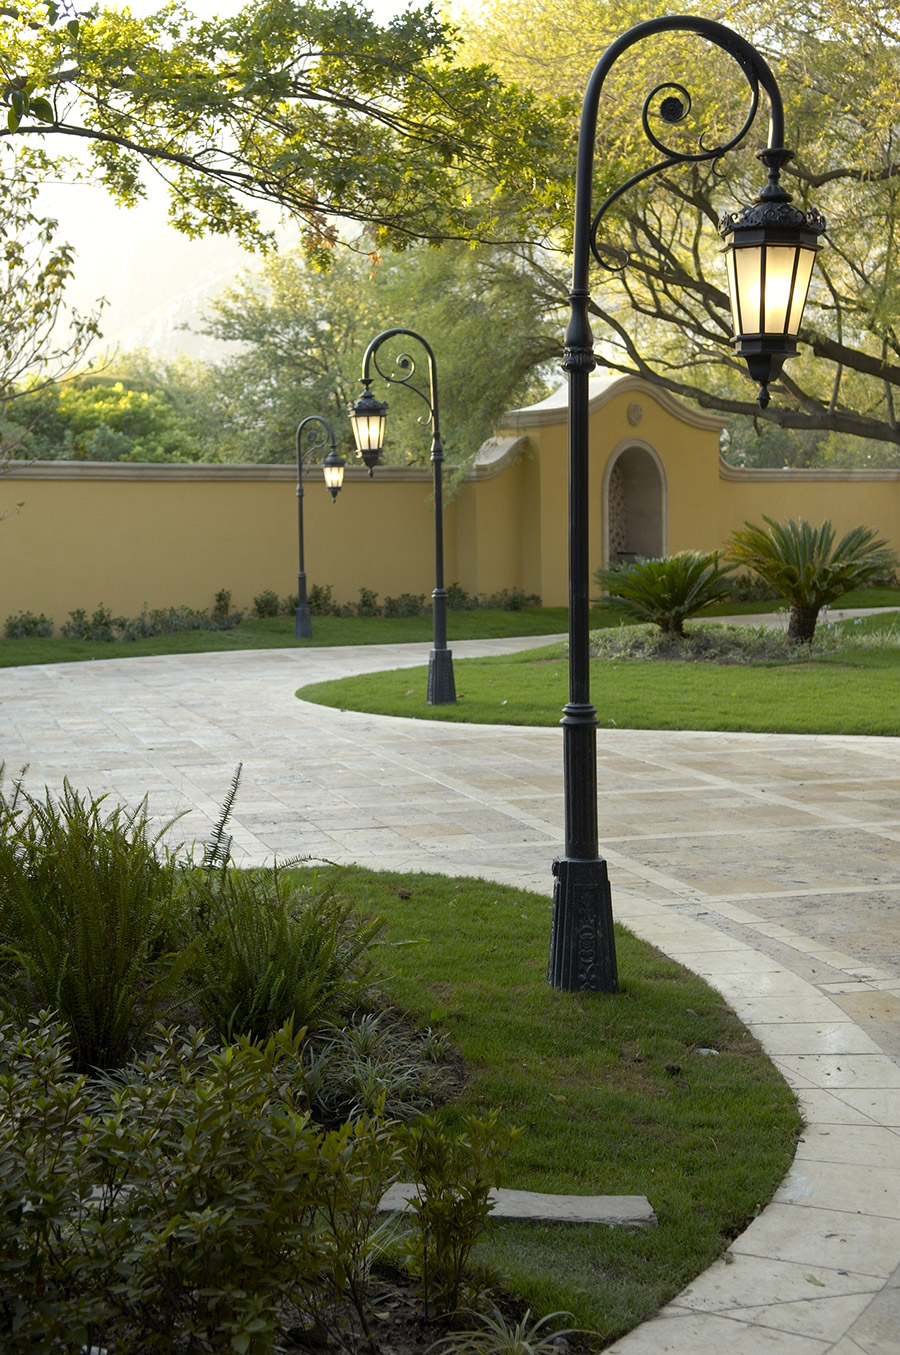 Chianti-OLS-CLA-E-003-classic--outdoor-Steel-Lighting-Post-Santa-Barbara-Residence-(36)